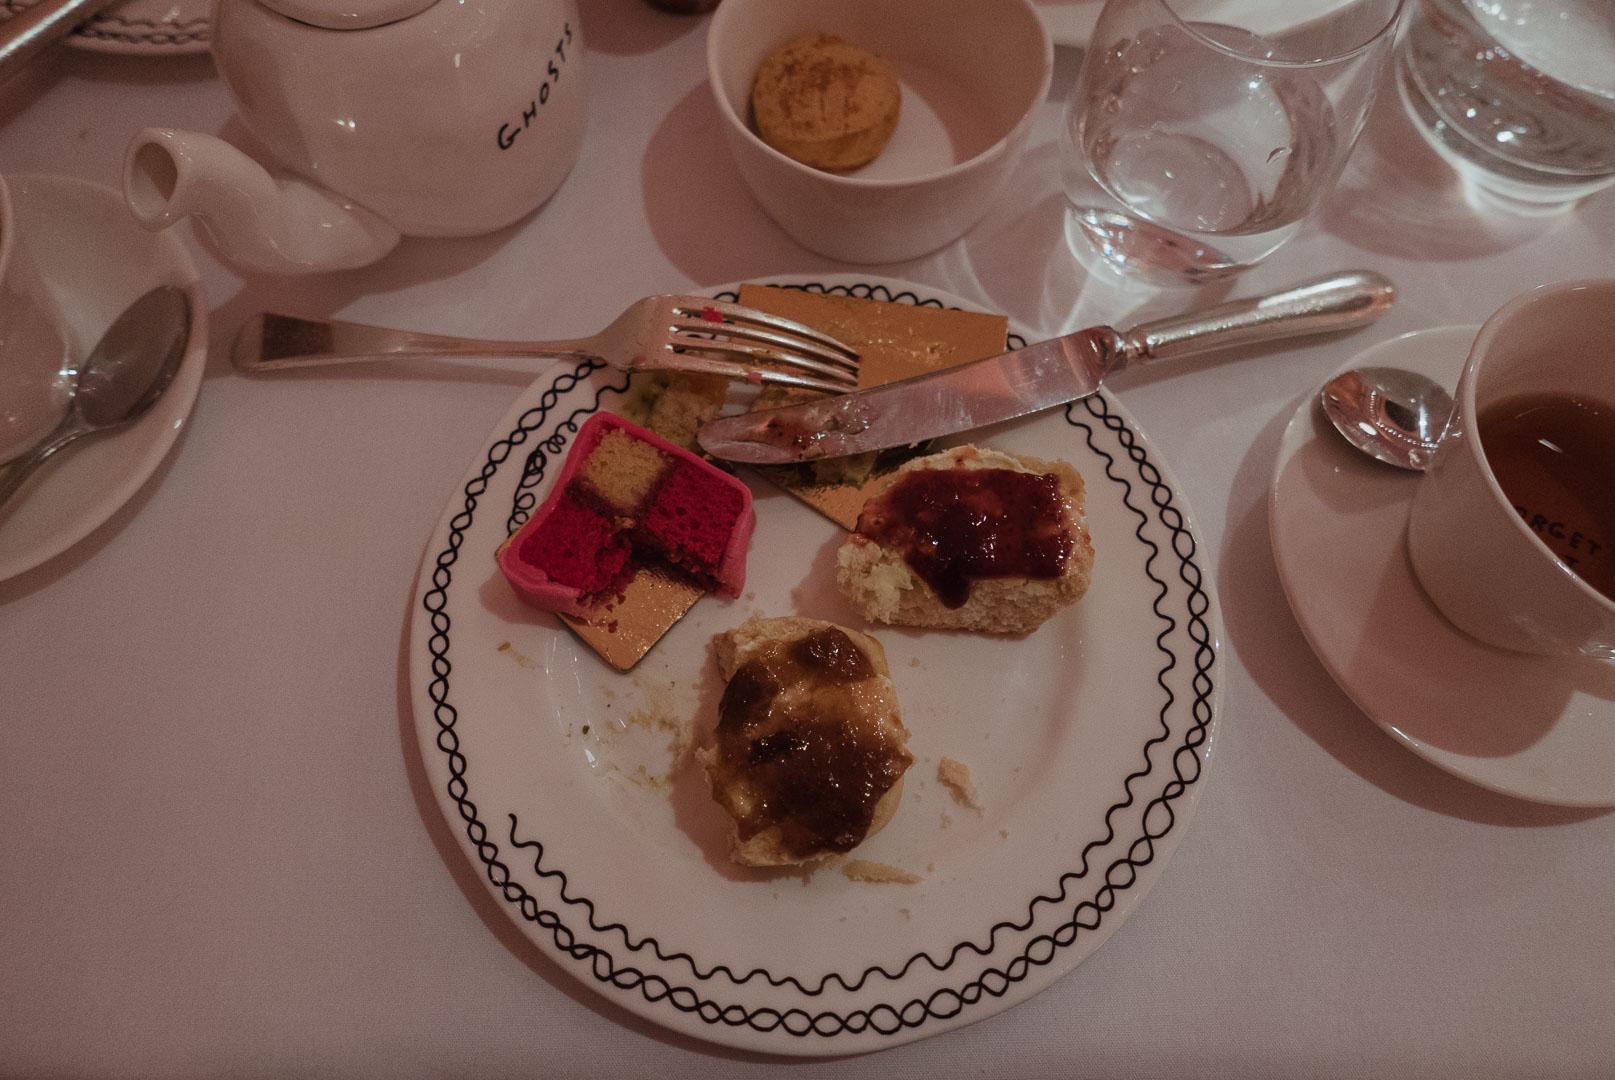 Battenberg Cake & Scones with Clotted Cream and Jam.